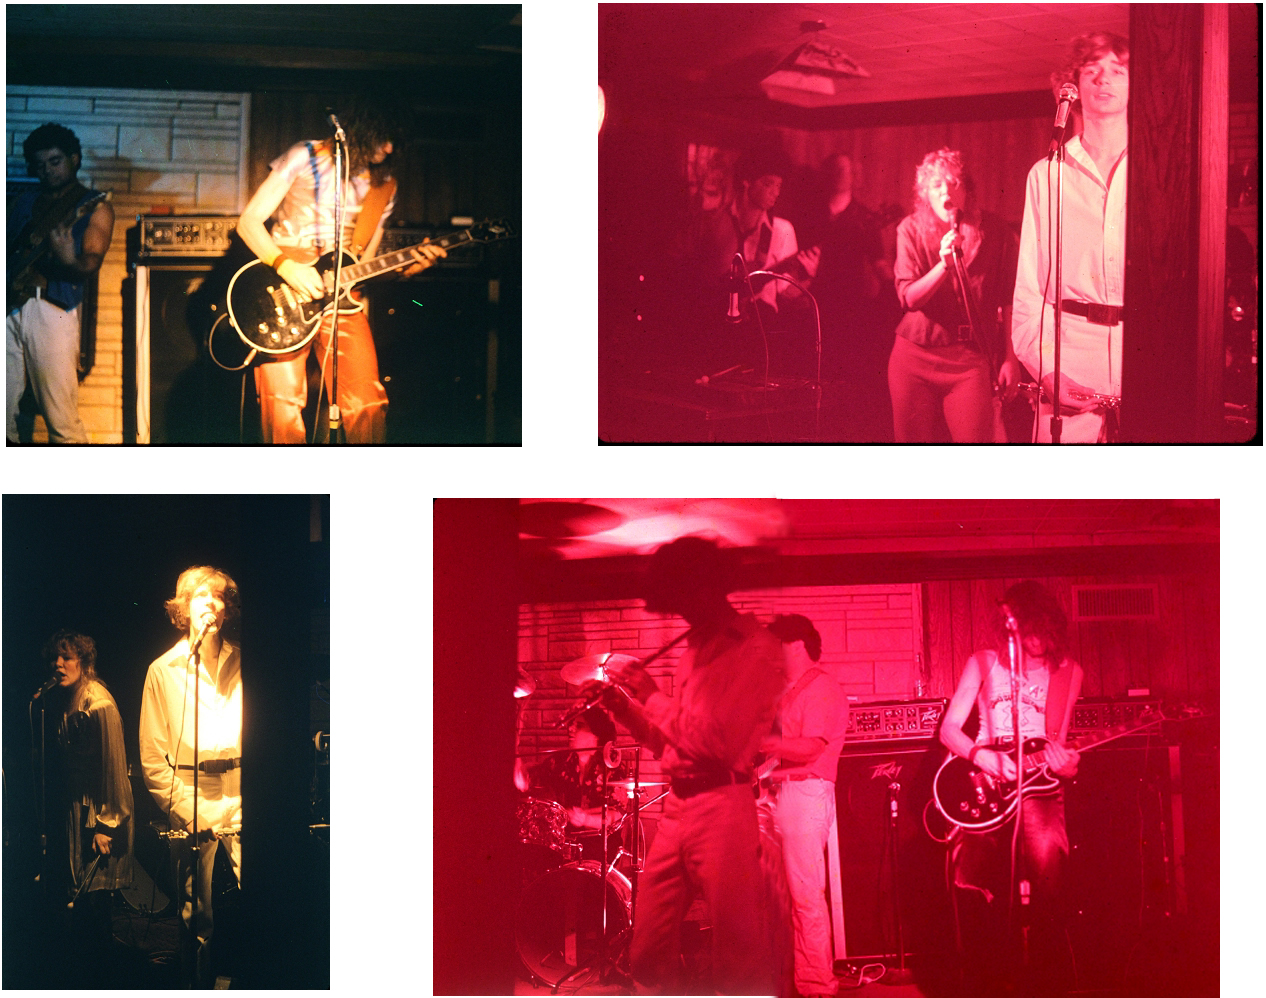 Parousia live - 1980